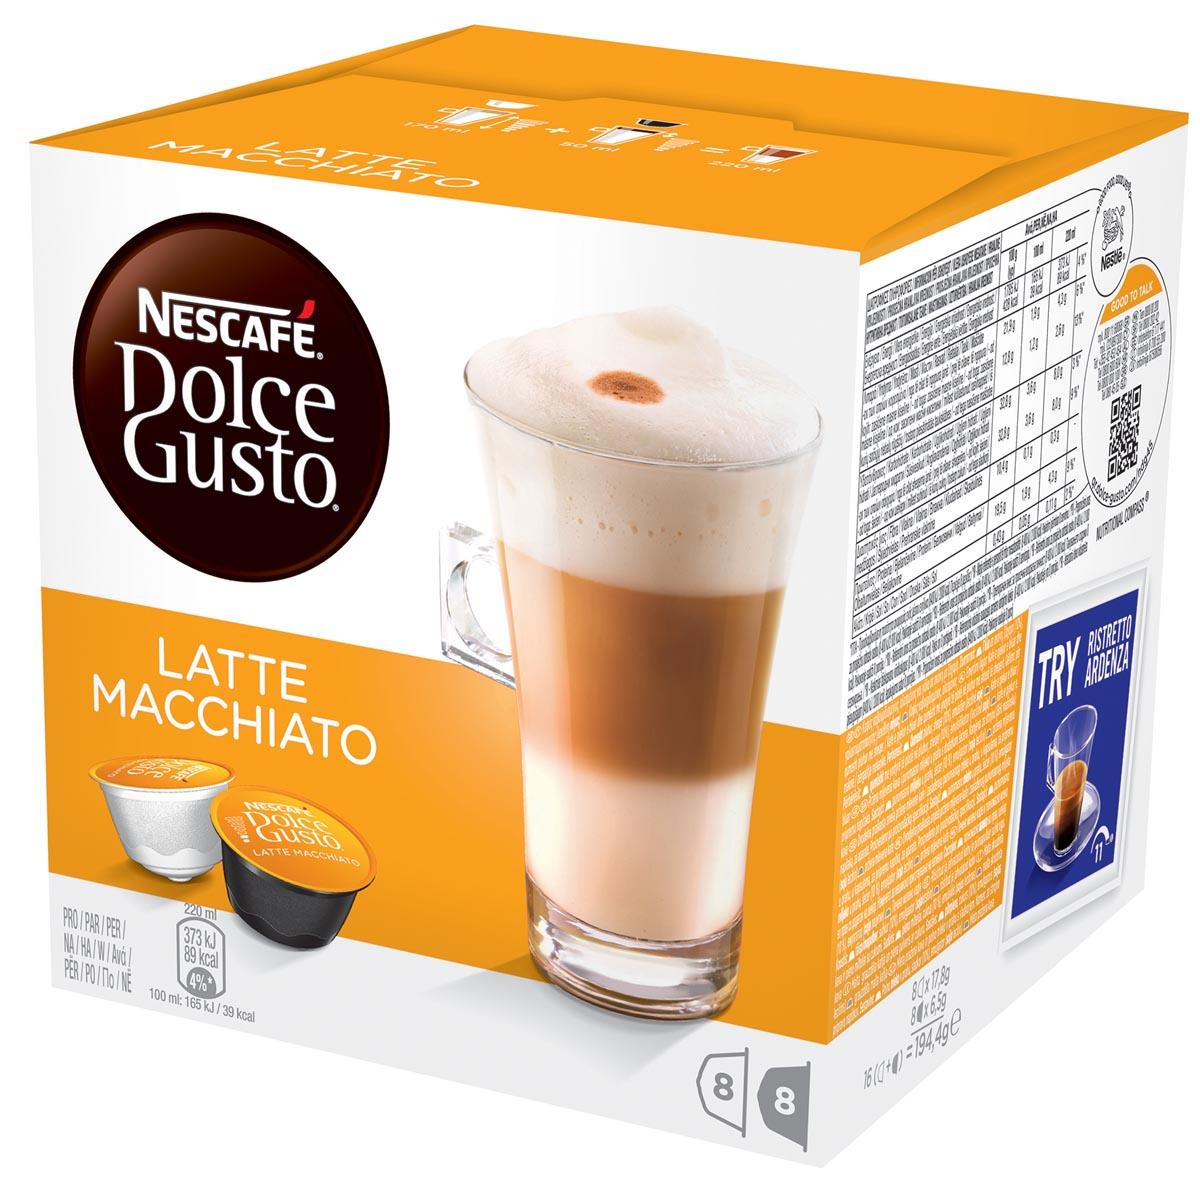 Nescafé Dolce Gusto koffiepads, Latte Macchiato, pak van 16 stuks